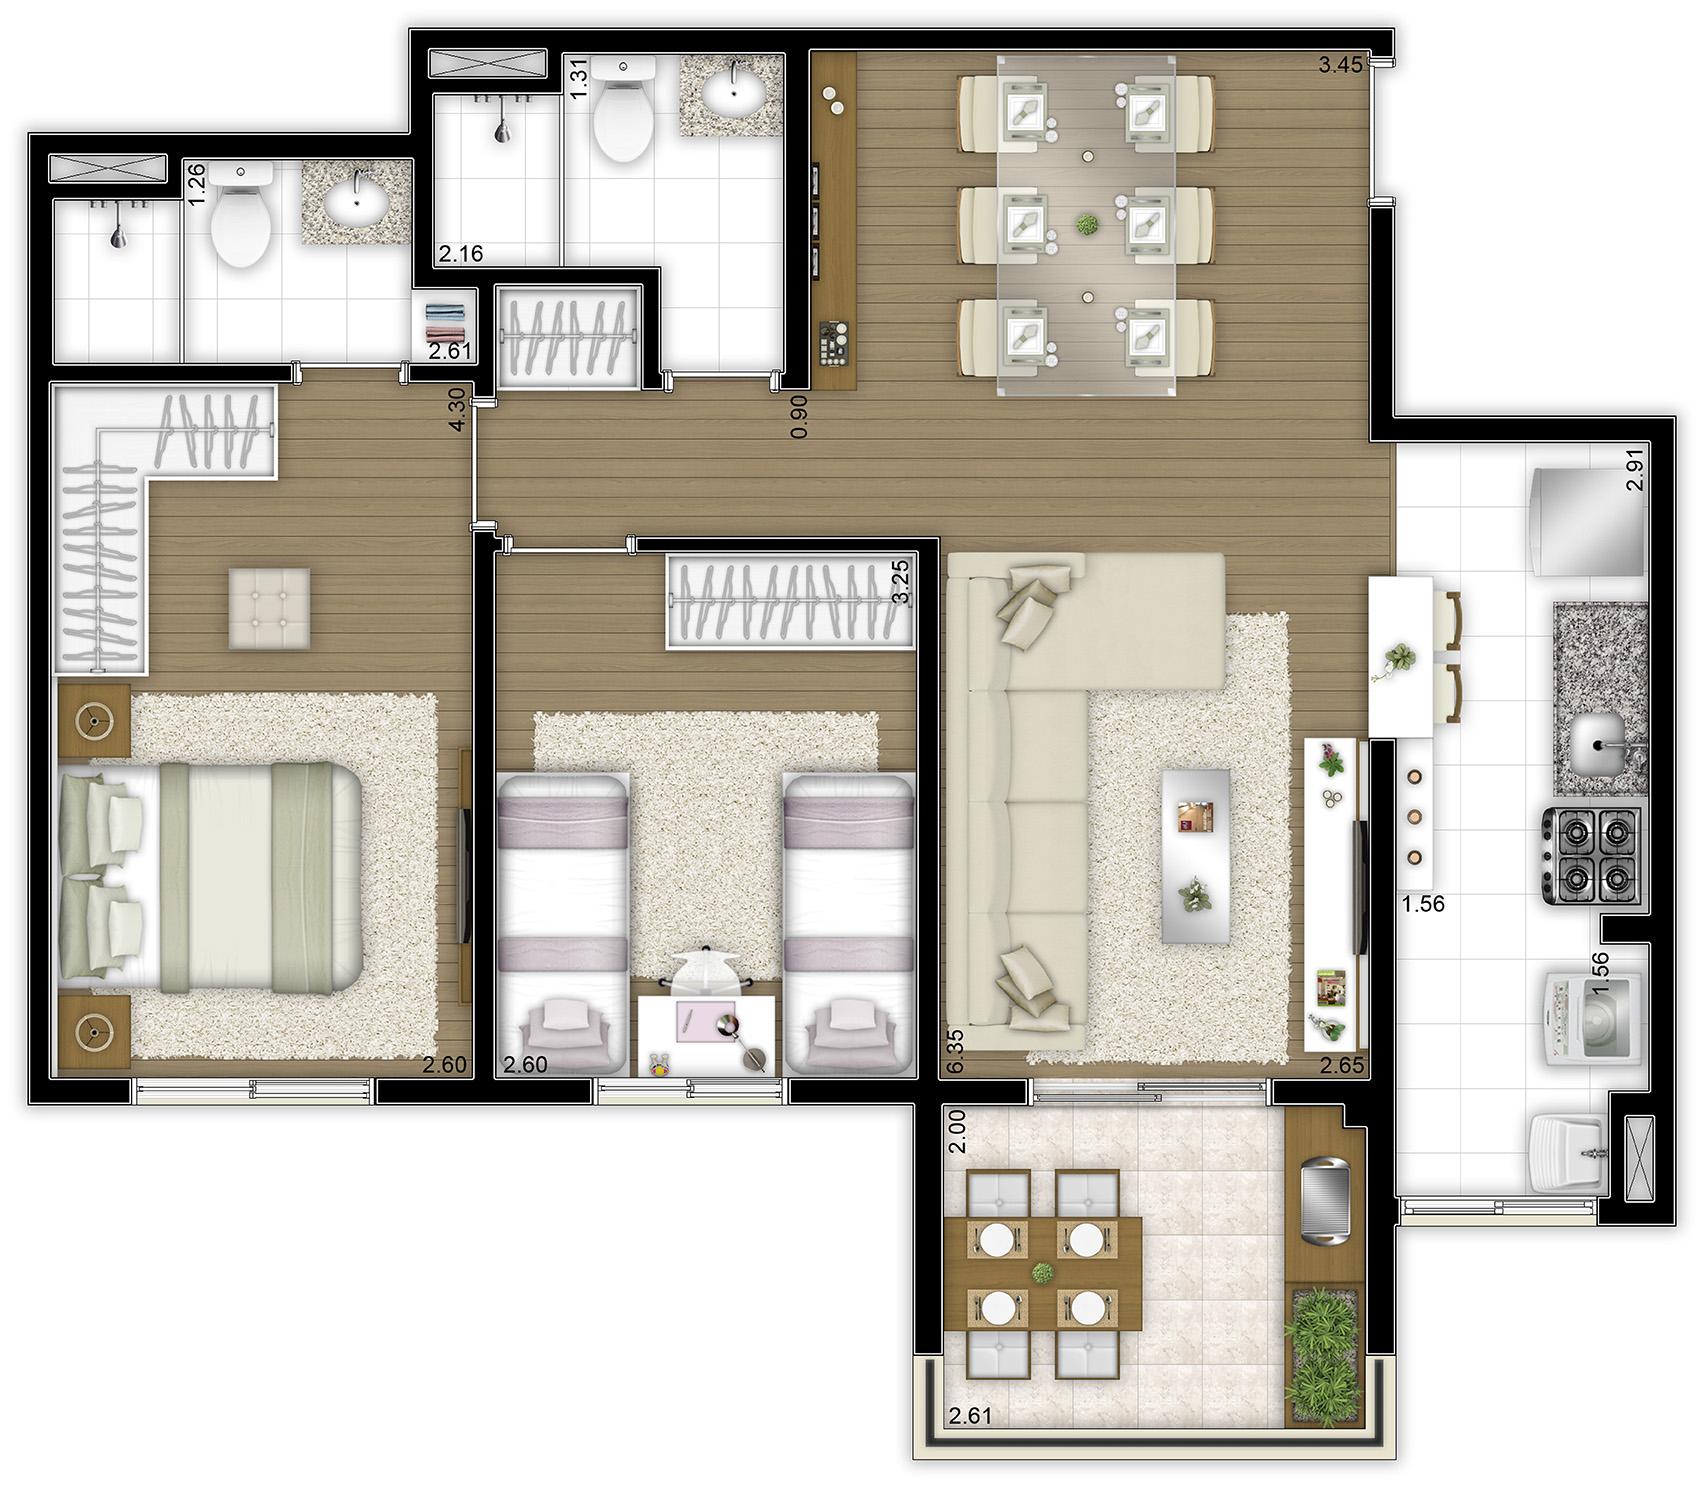 69,70 m² - 2 dorms